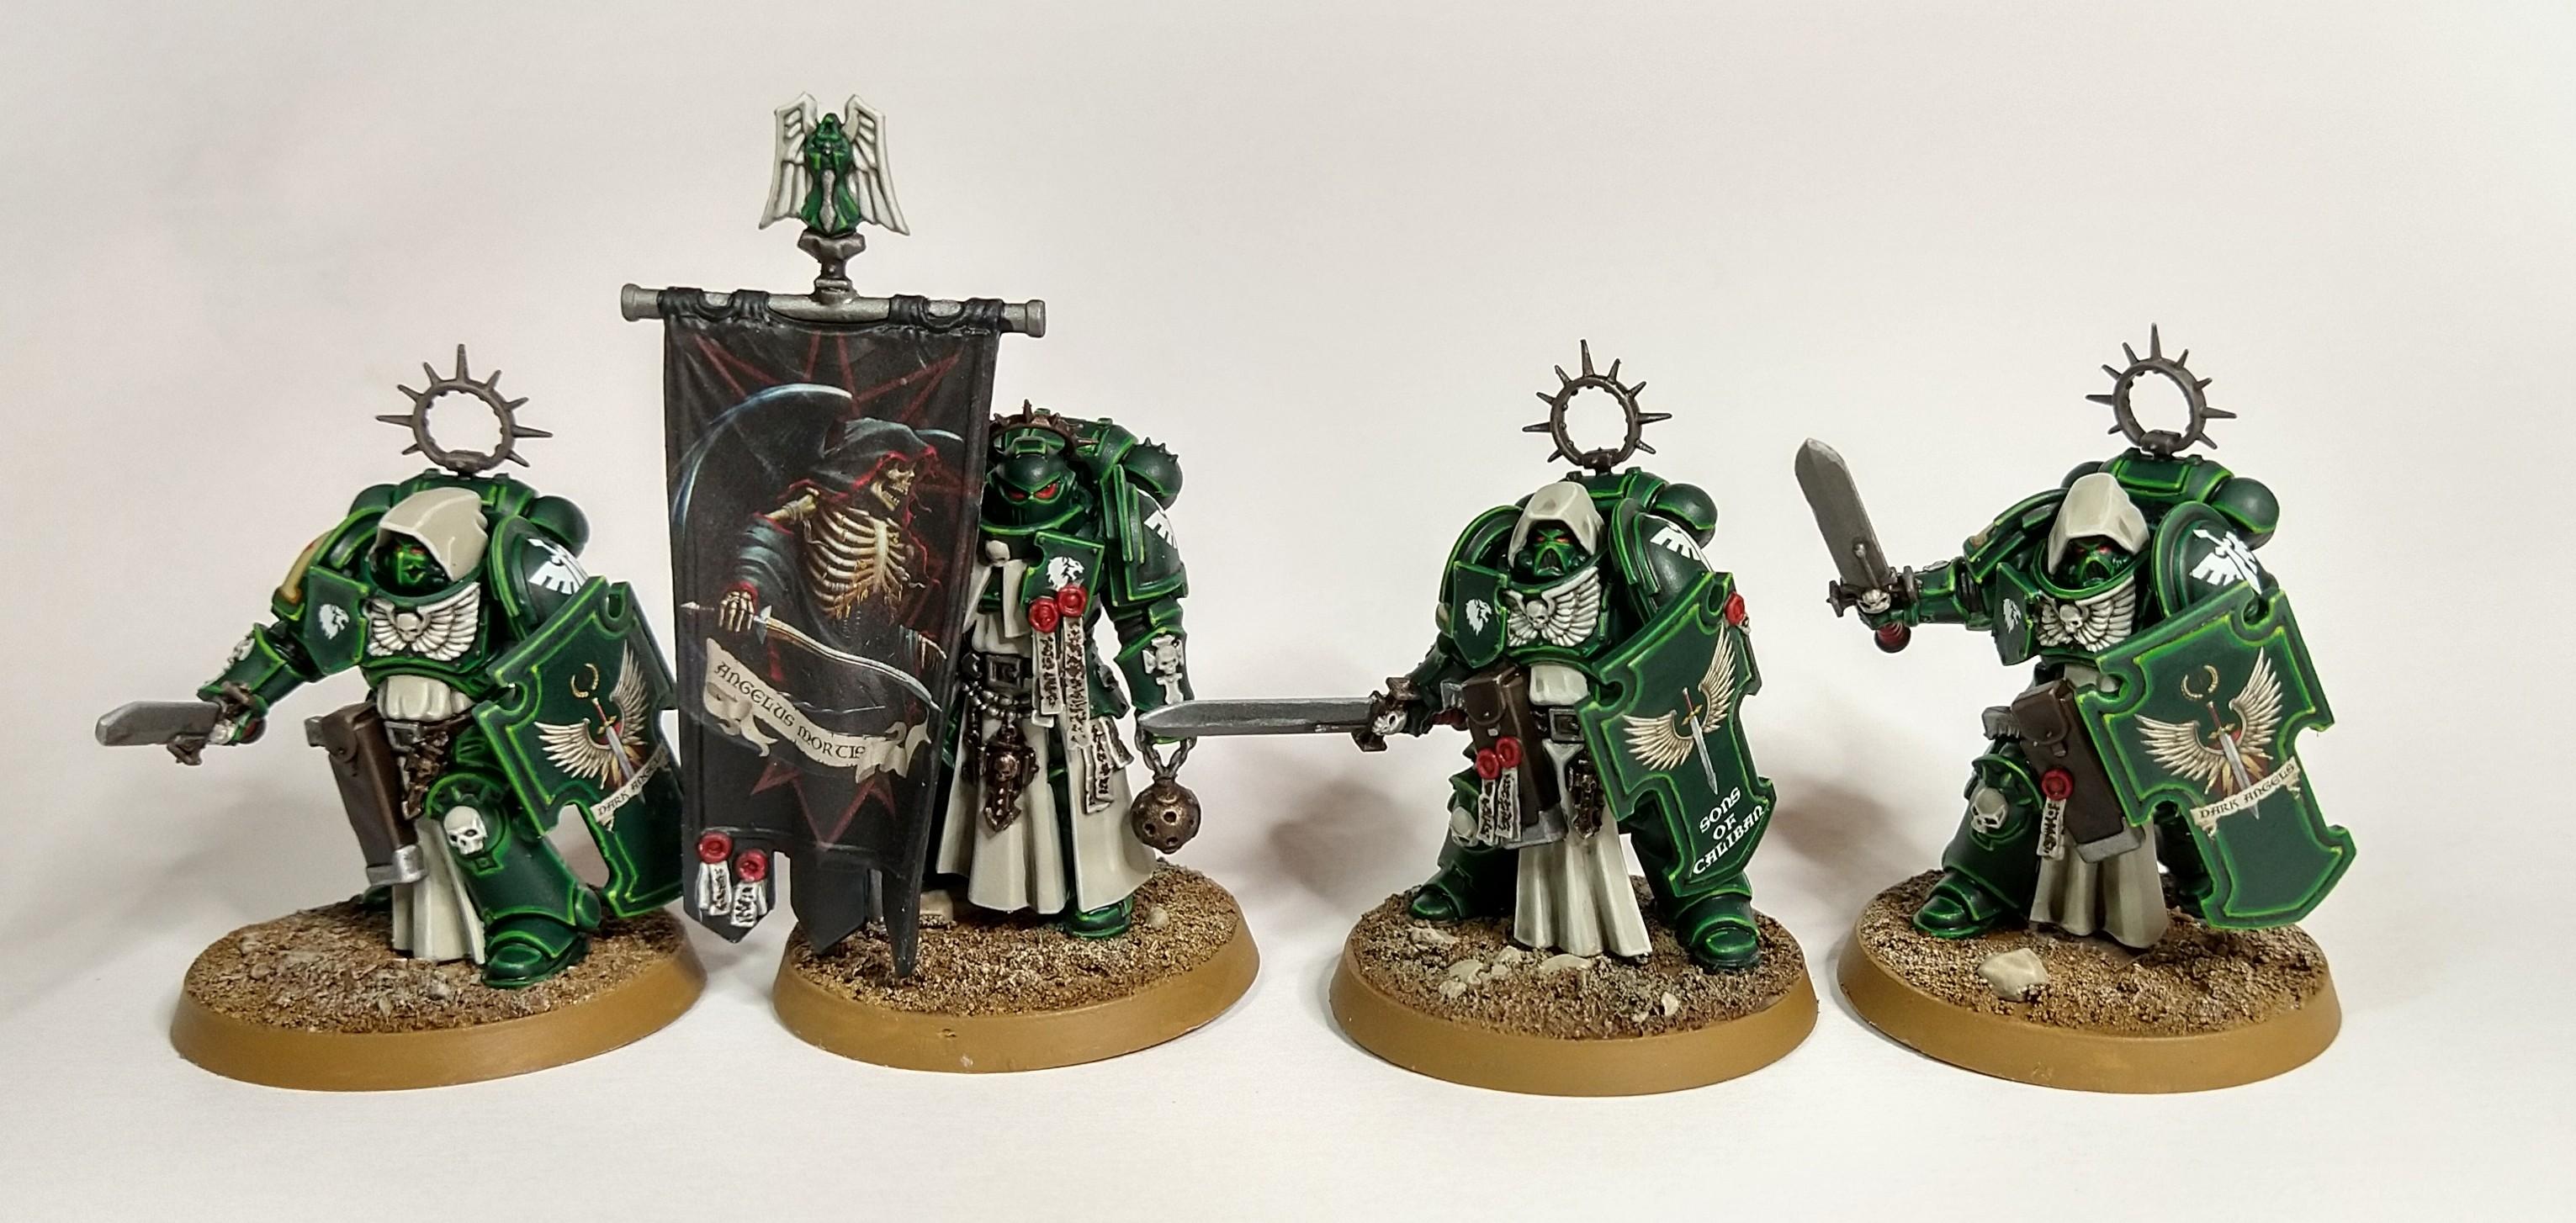 Dark-angels-bladeguard-veterans